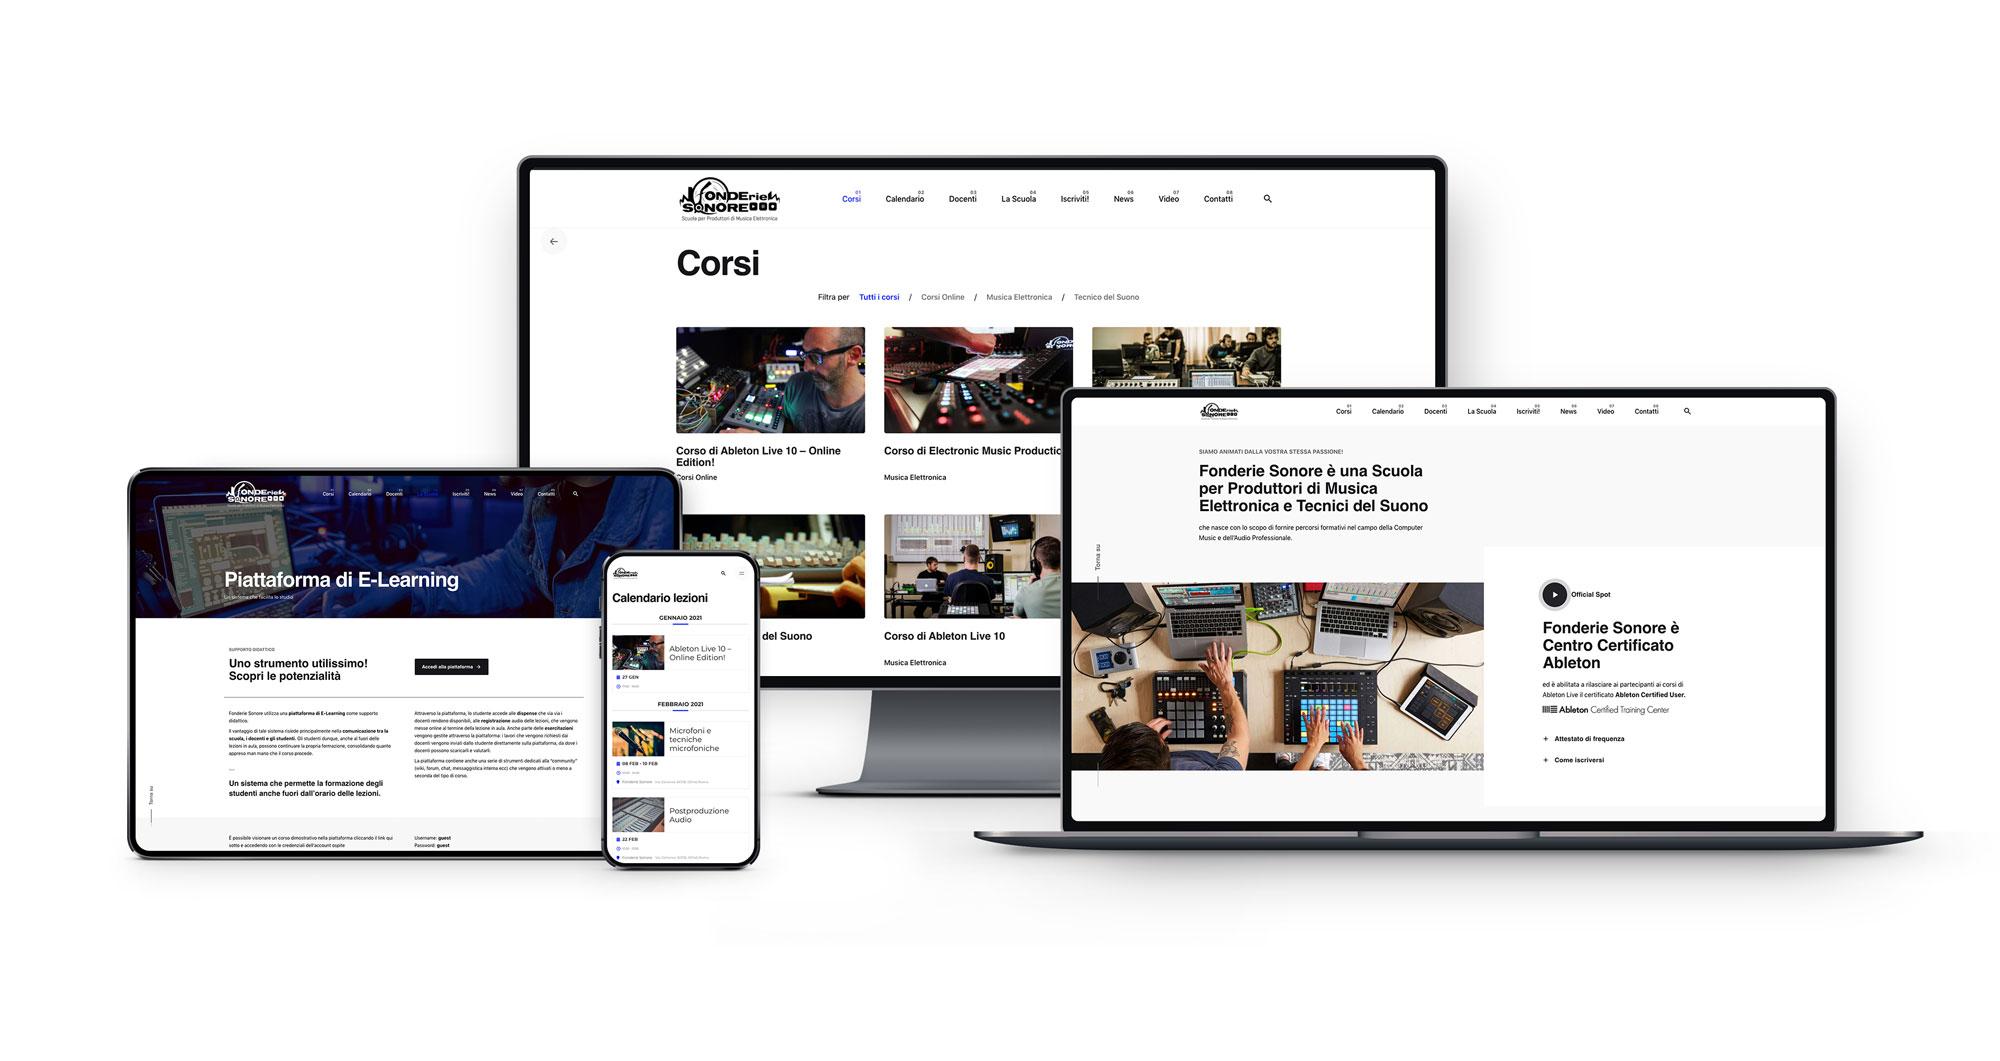 elisa-antonacci-fonderie-sonore-web-design